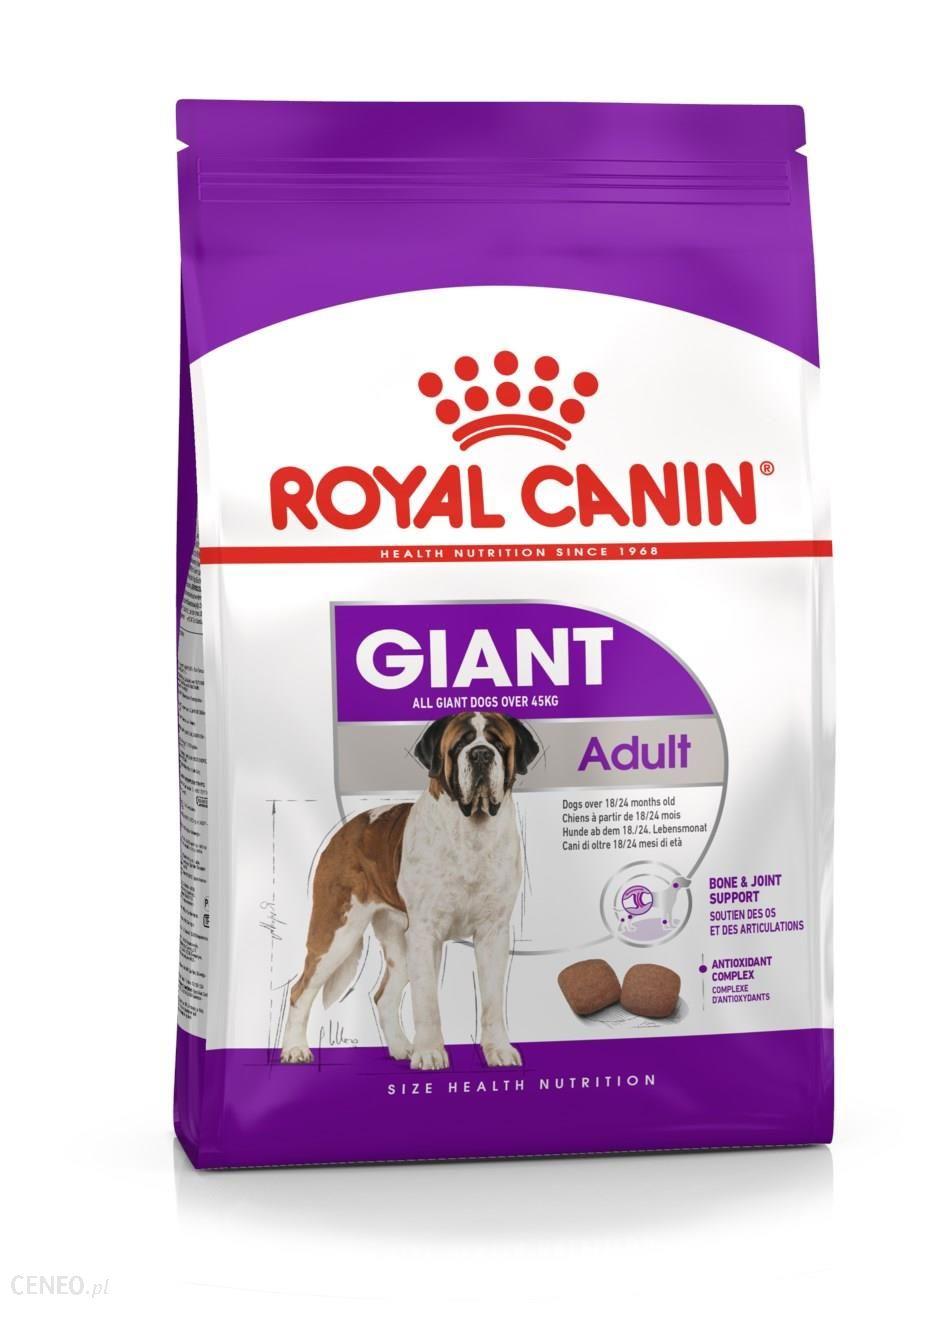 Royal Canin Giant Adult 18Kg